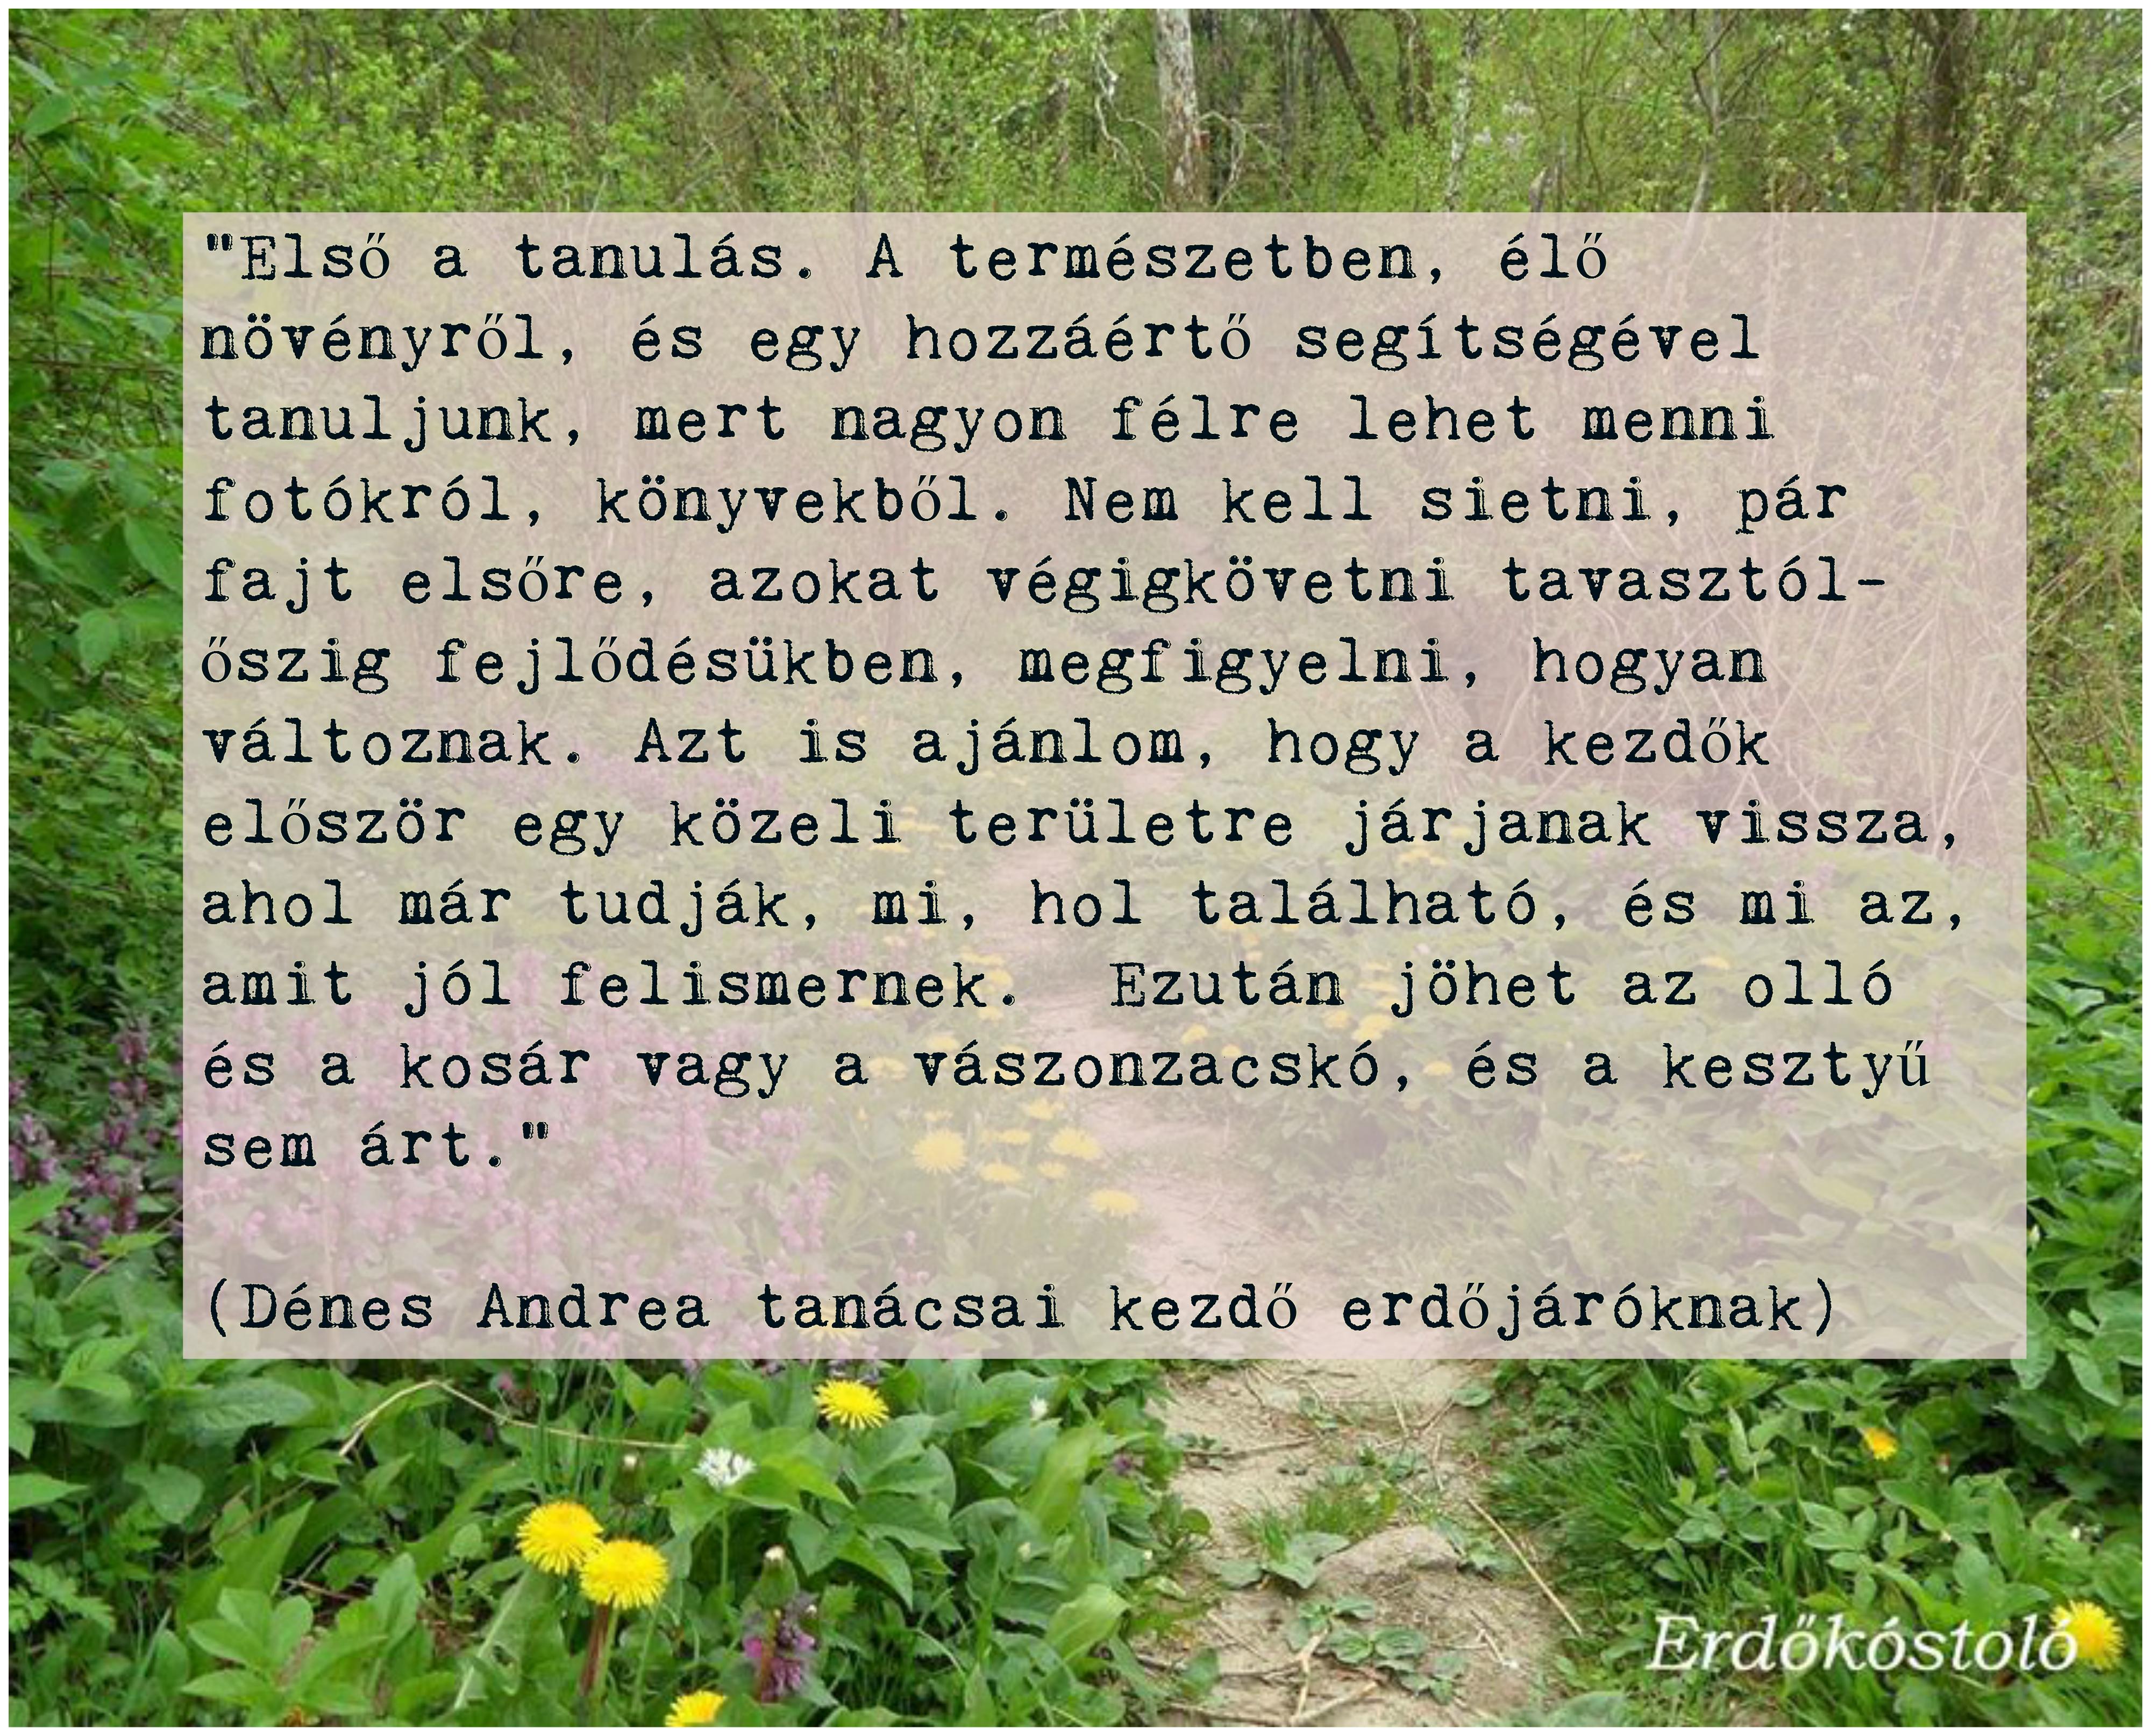 elso_a_tanulas.jpg